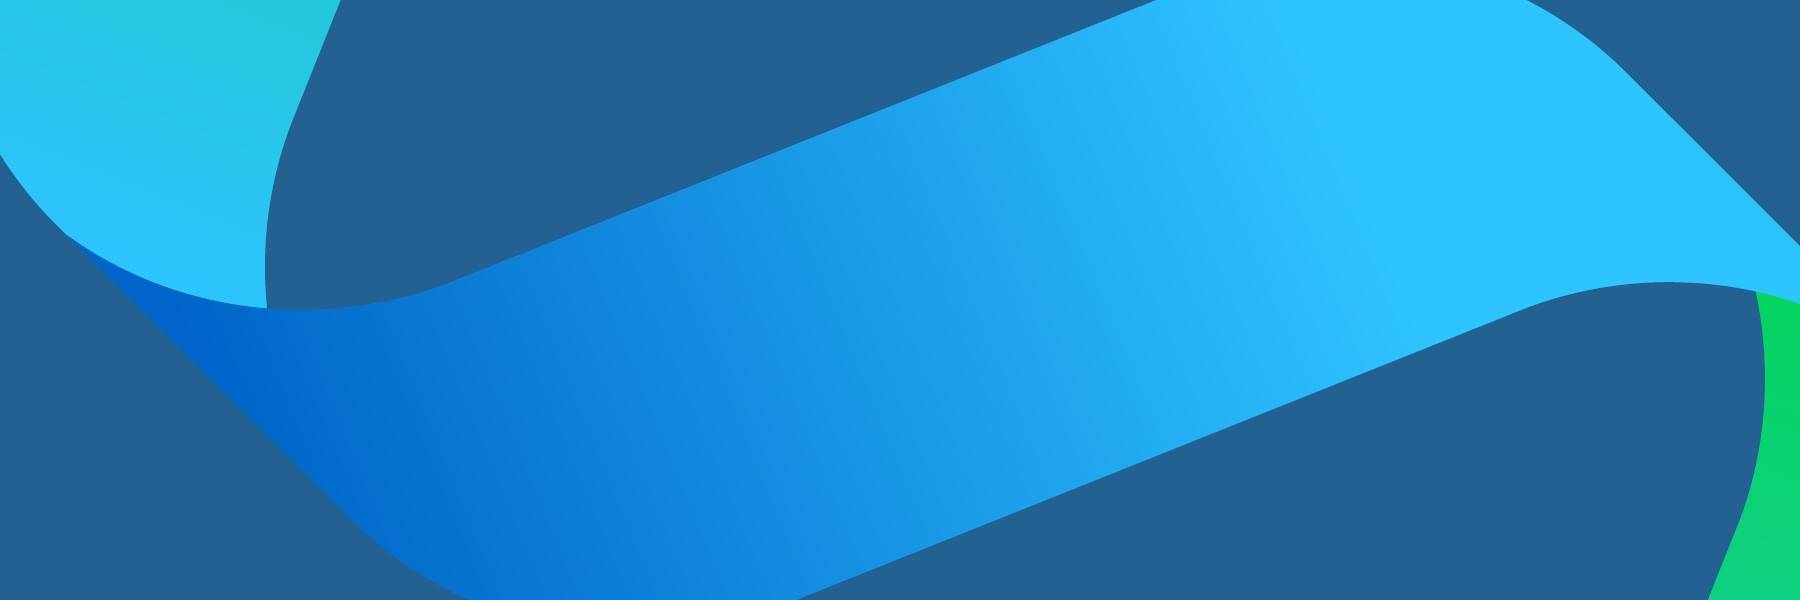 VWR, part of Avantor | LinkedIn